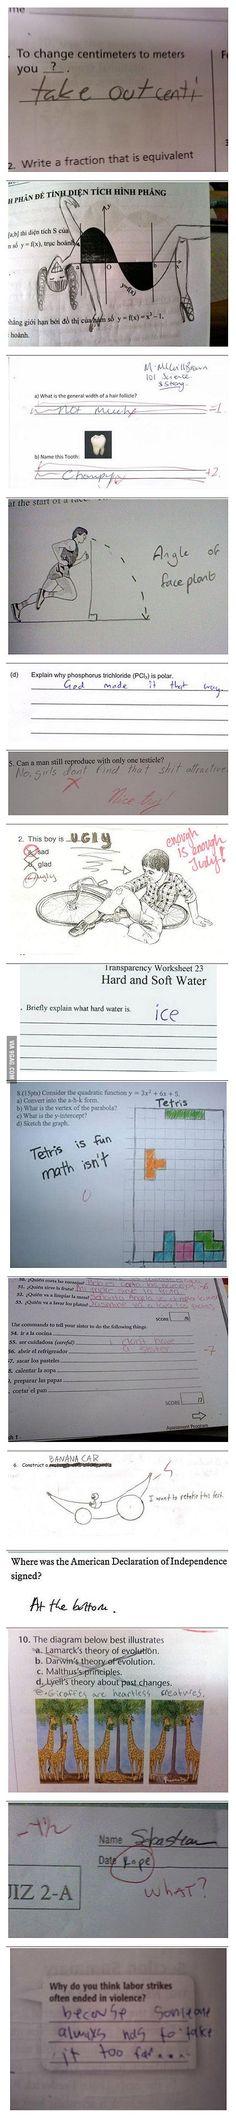 Some funny exam answers! {Tetris & the giraffes! Lol}